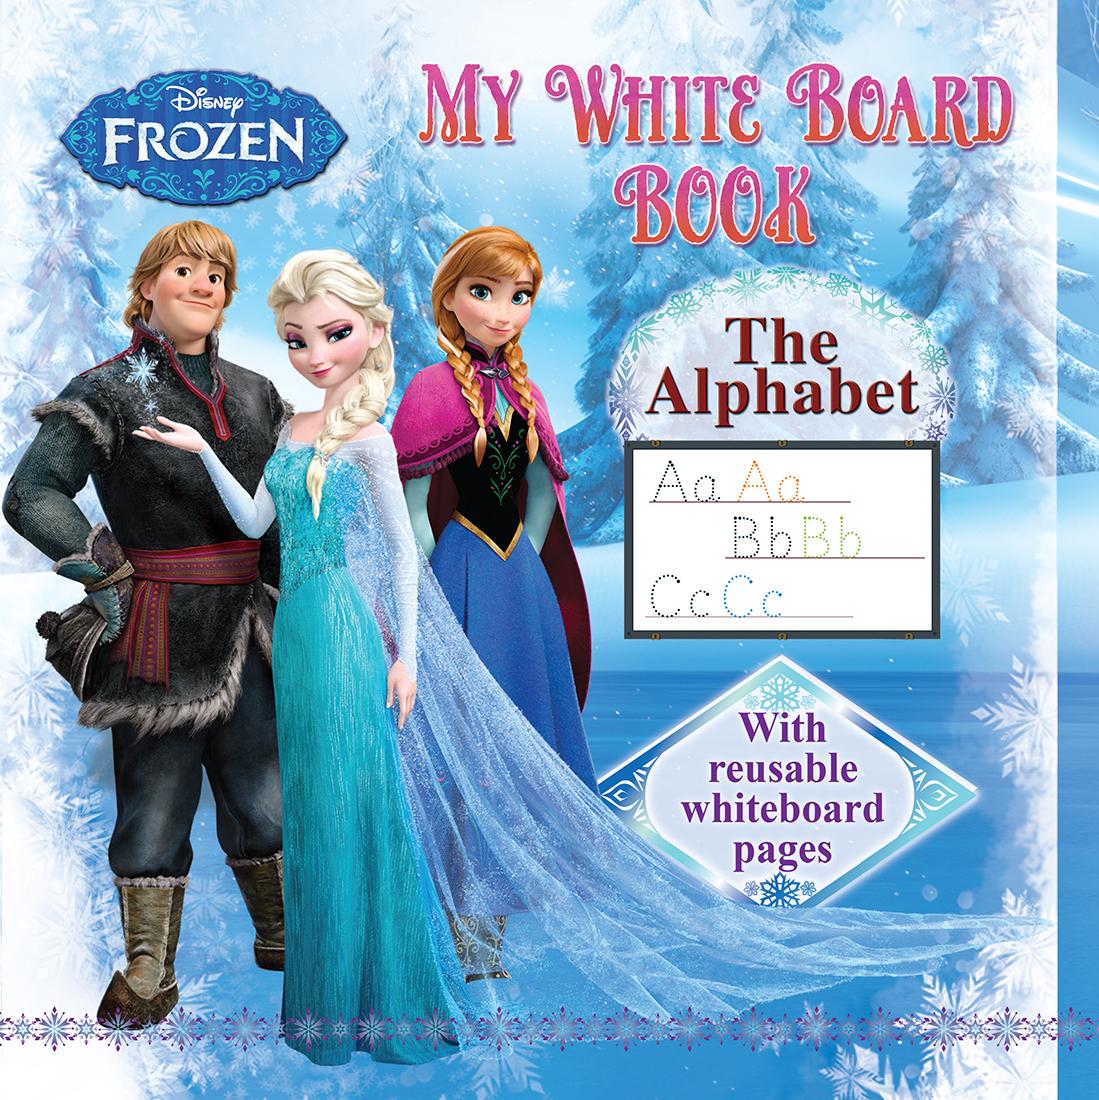 Disney Frozen My White Board Book